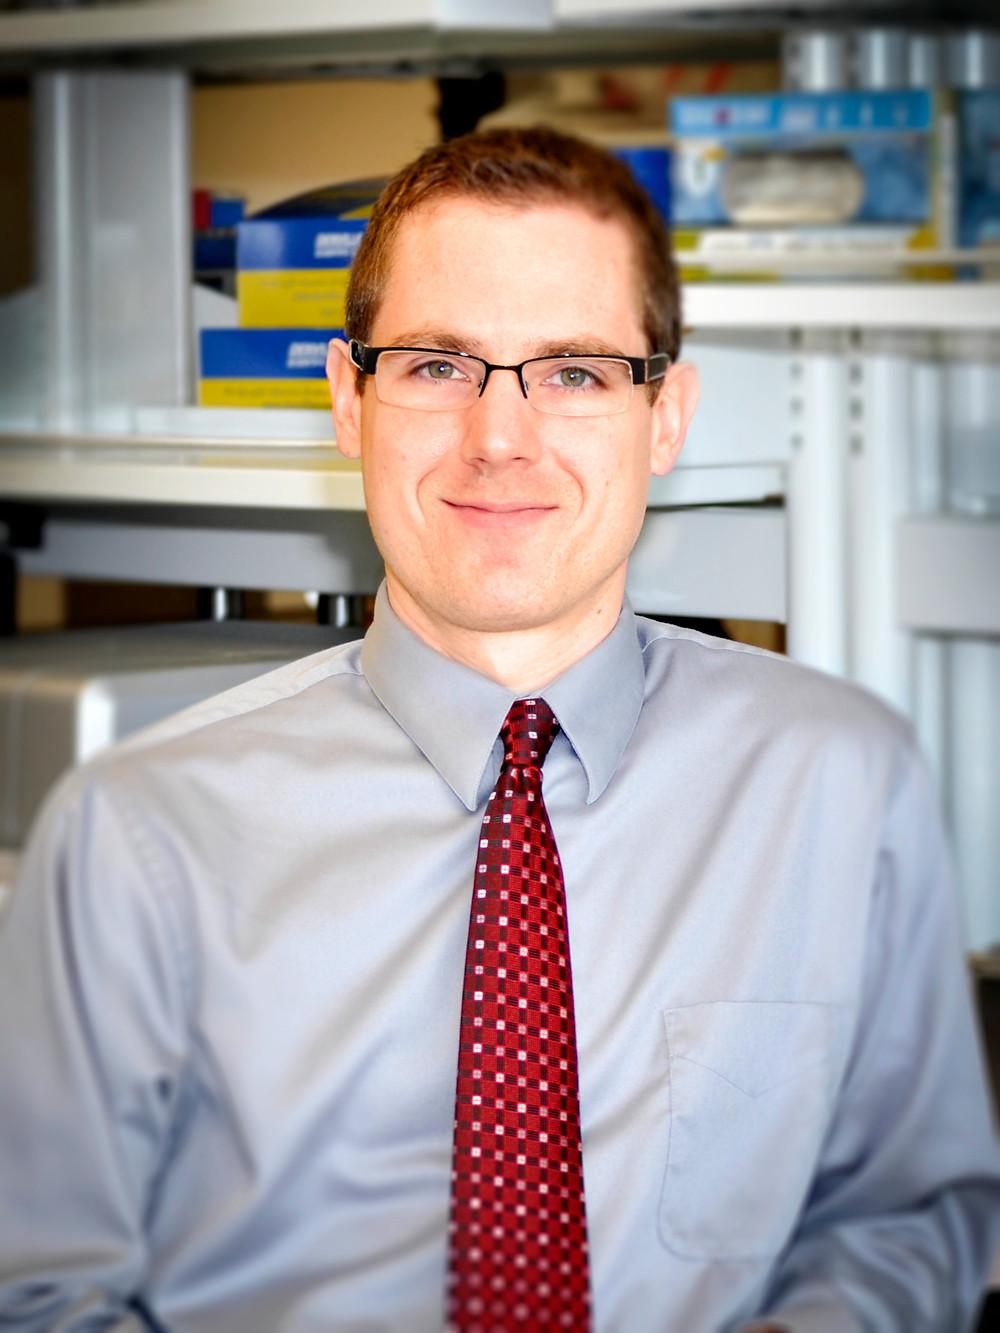 Brandon Gufford, PharmD., PhD